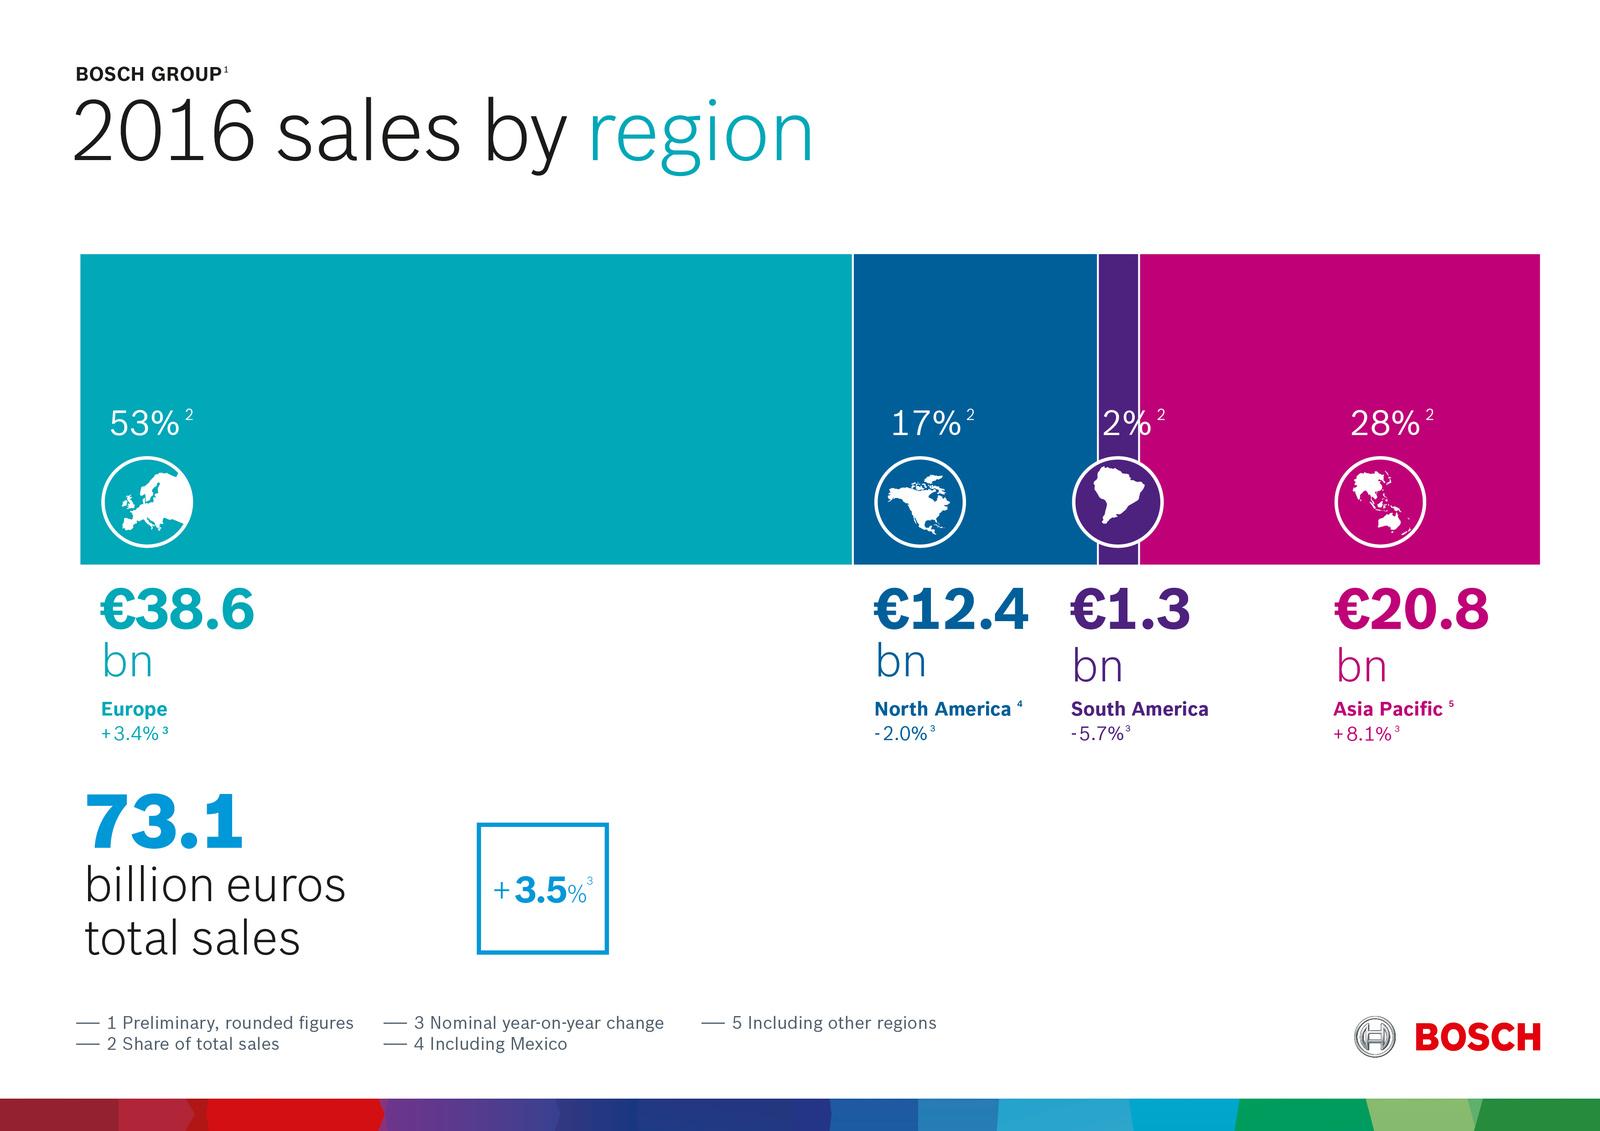 Preliminary key data 2016 Performance by region